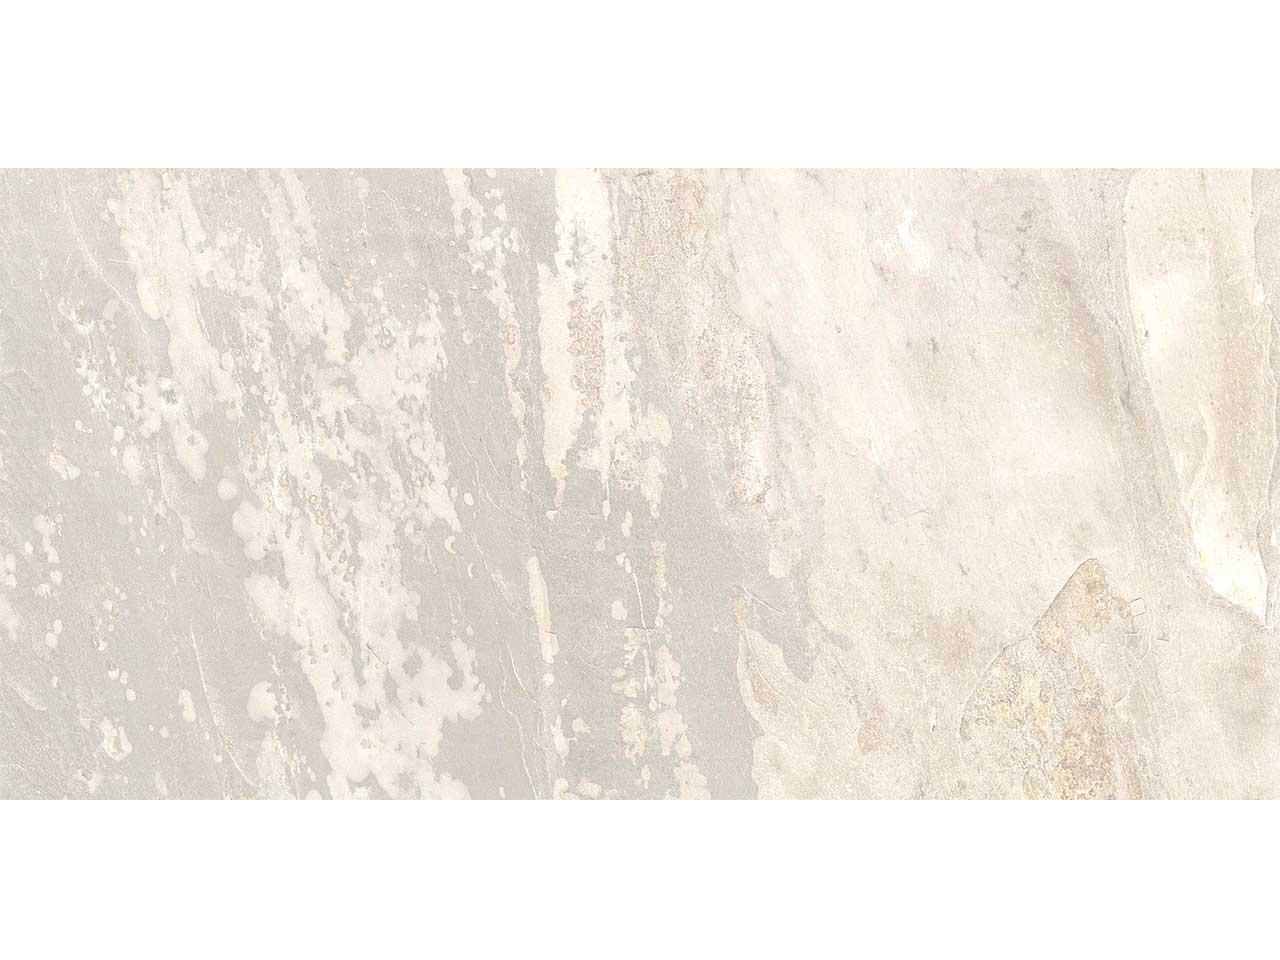 Bengal winter 30x60 4 iperceramica for Gres porcellanato immagini